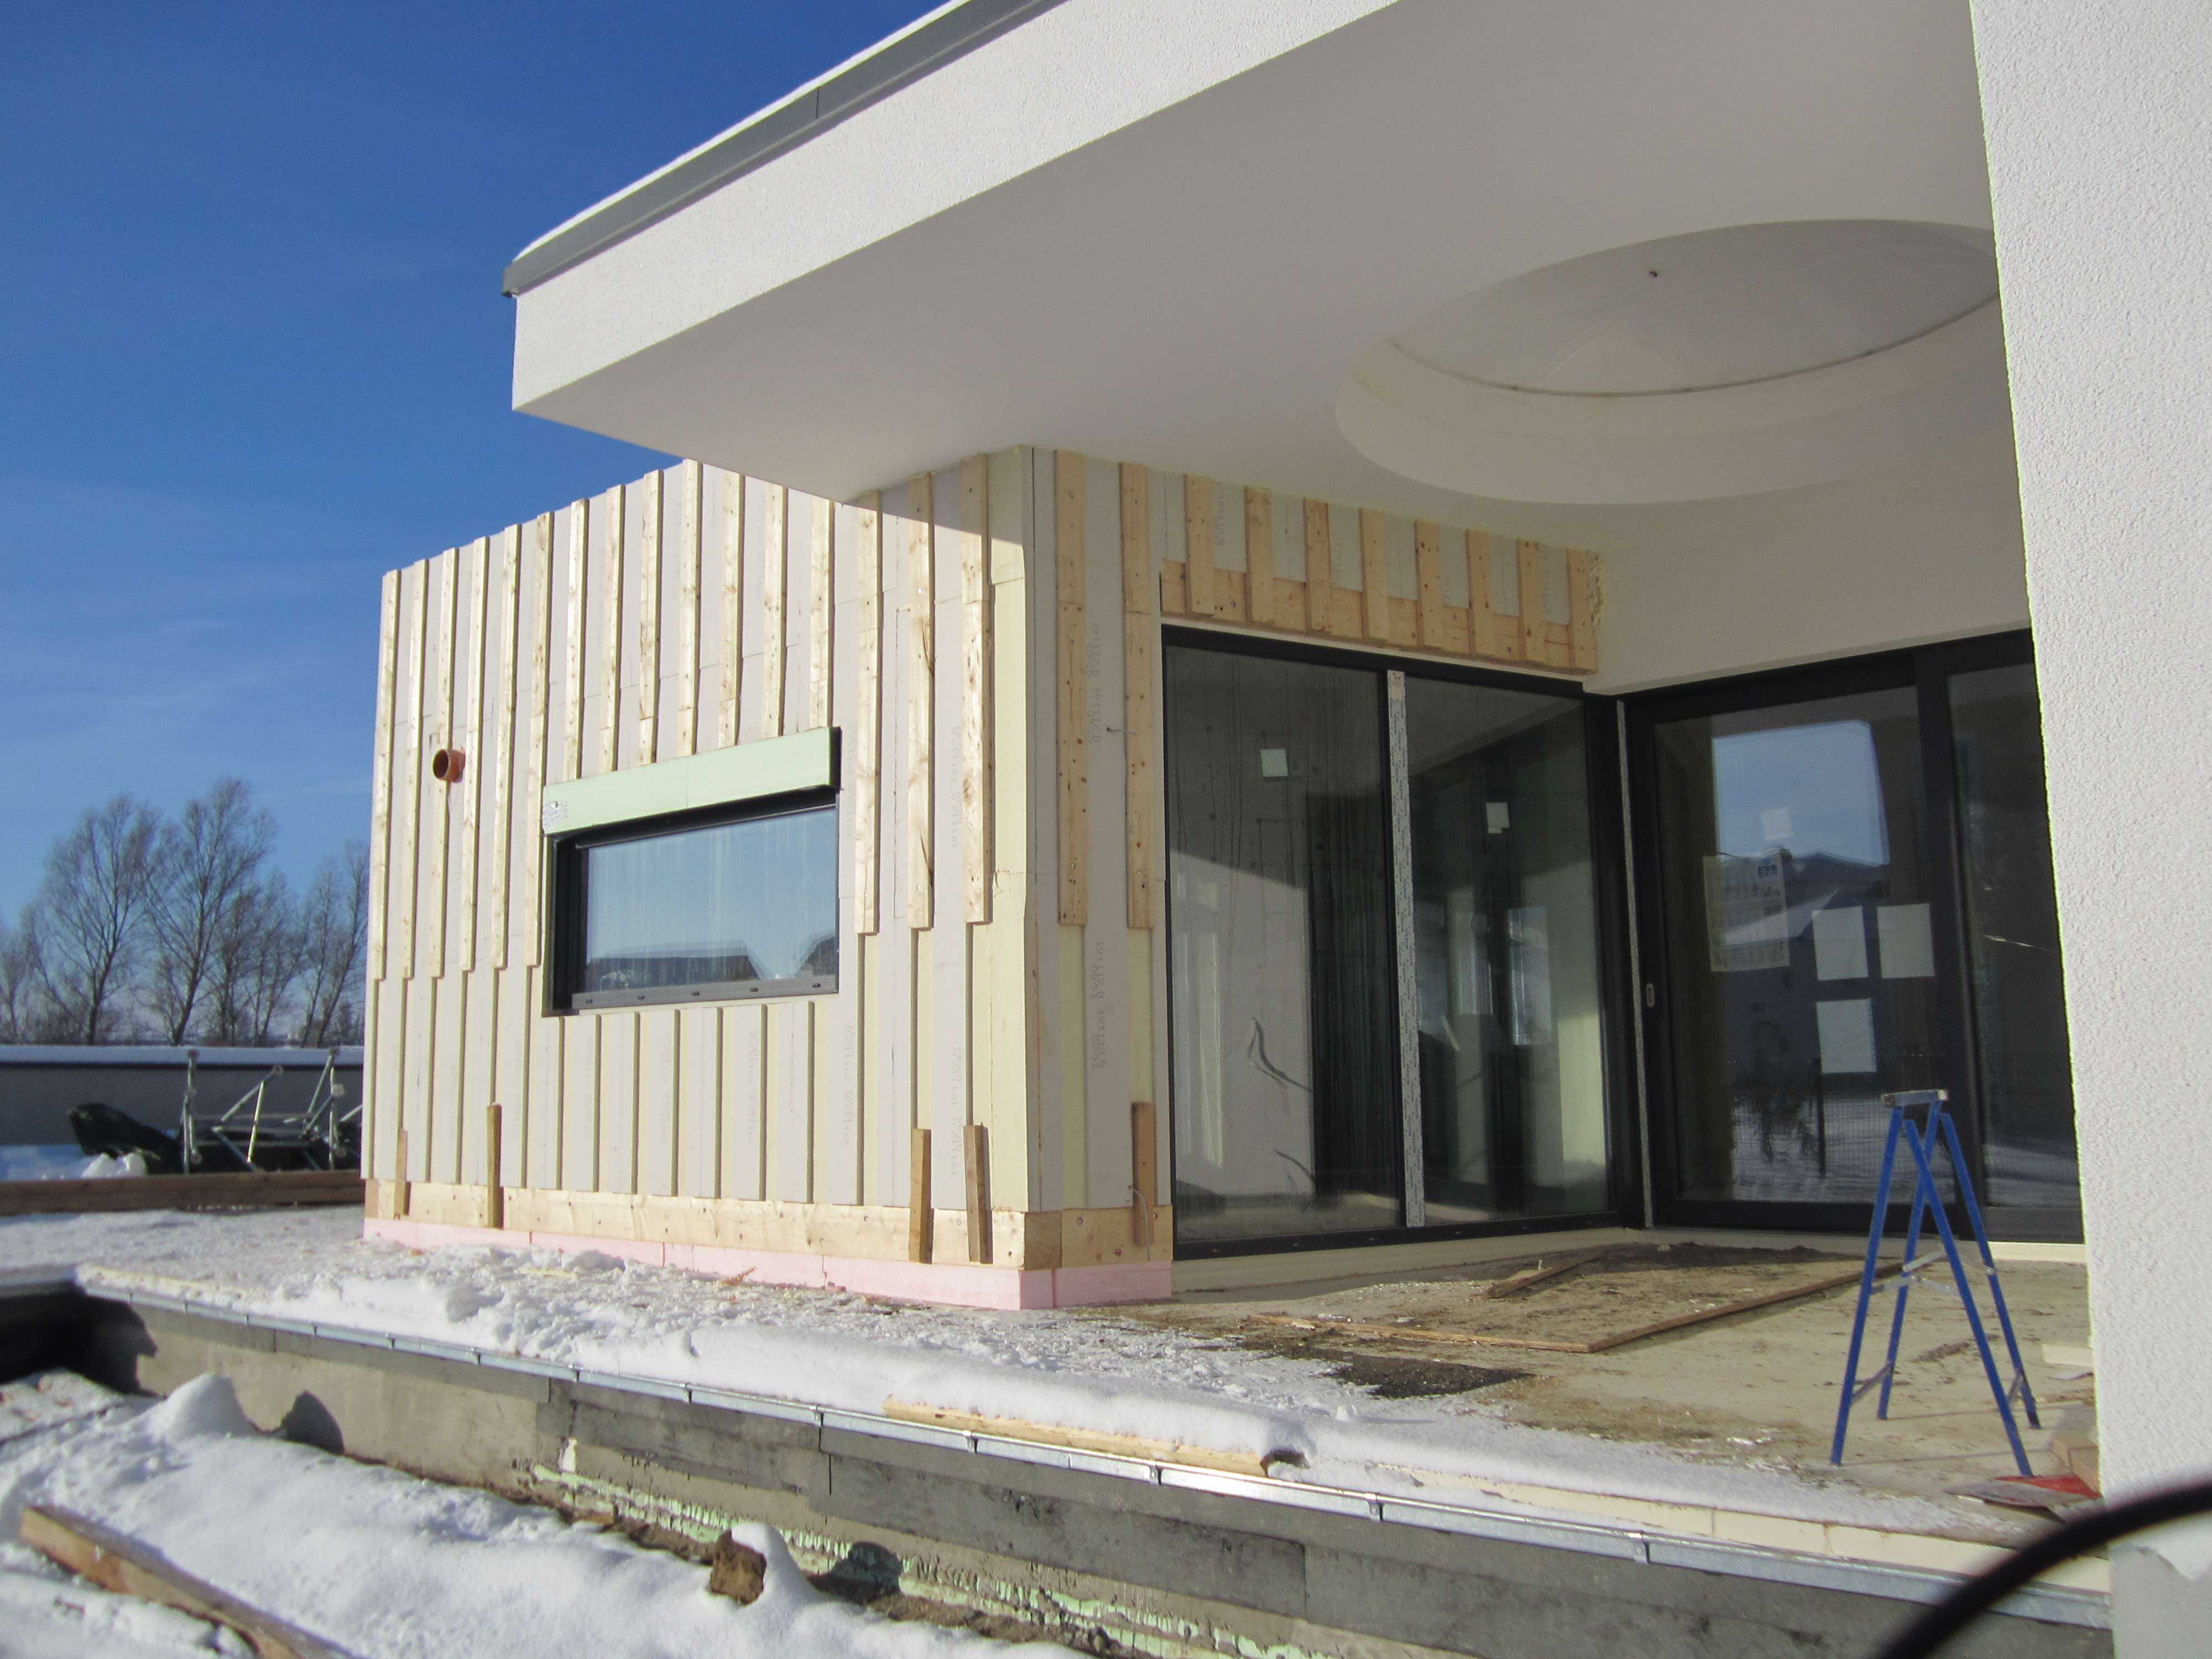 wenn 39 s ums dach geht dachdecker meister holger scheibe fassadend mmung. Black Bedroom Furniture Sets. Home Design Ideas